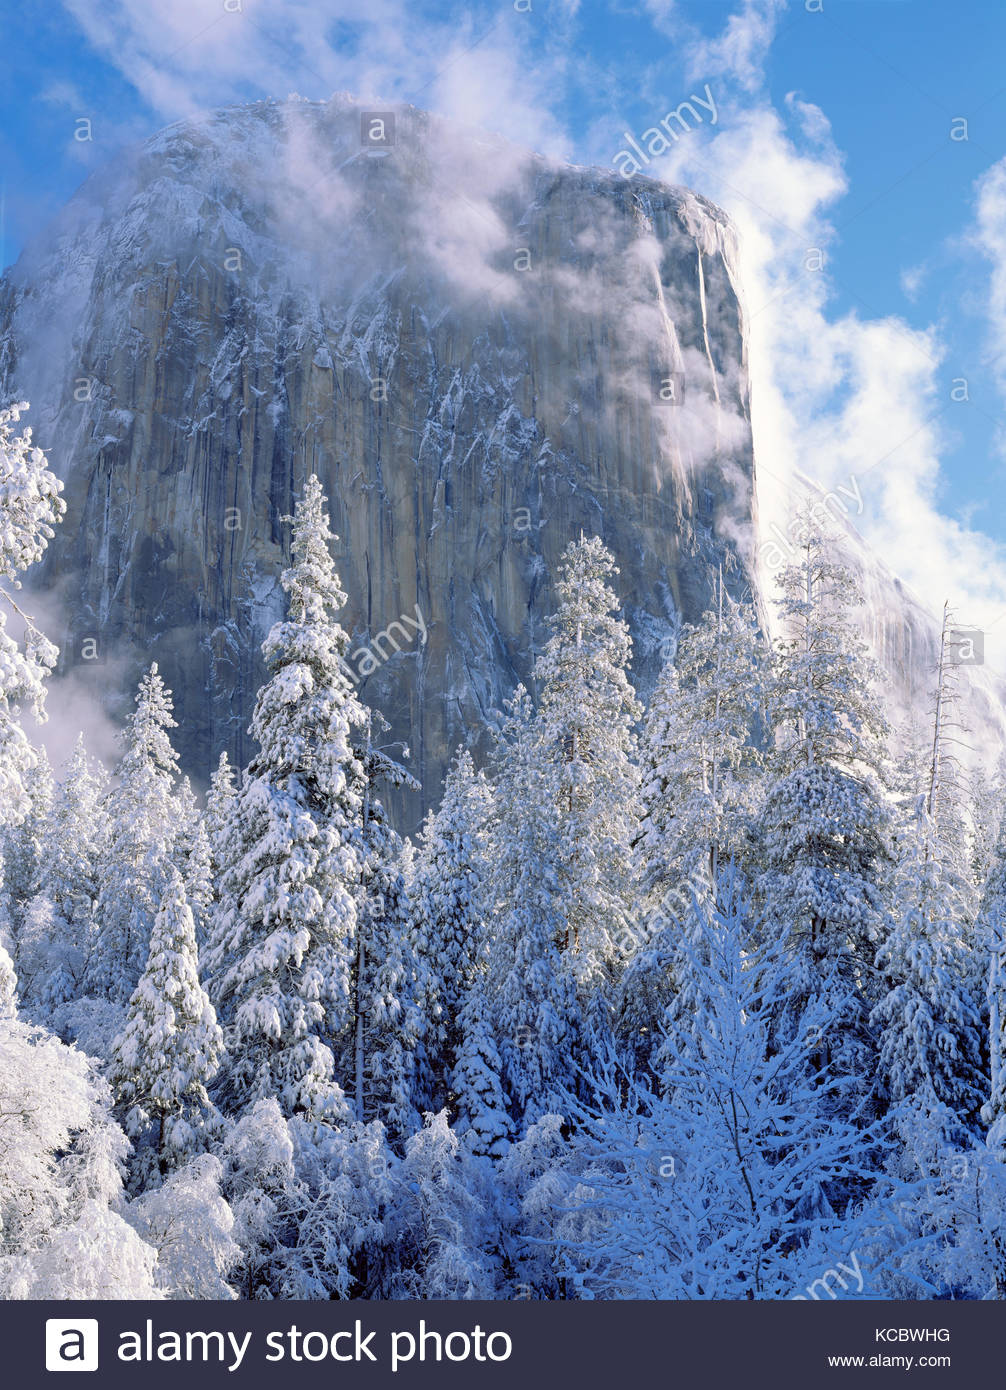 El Capitan after Snowstorm,Yosemite National Park, California - Stock Image